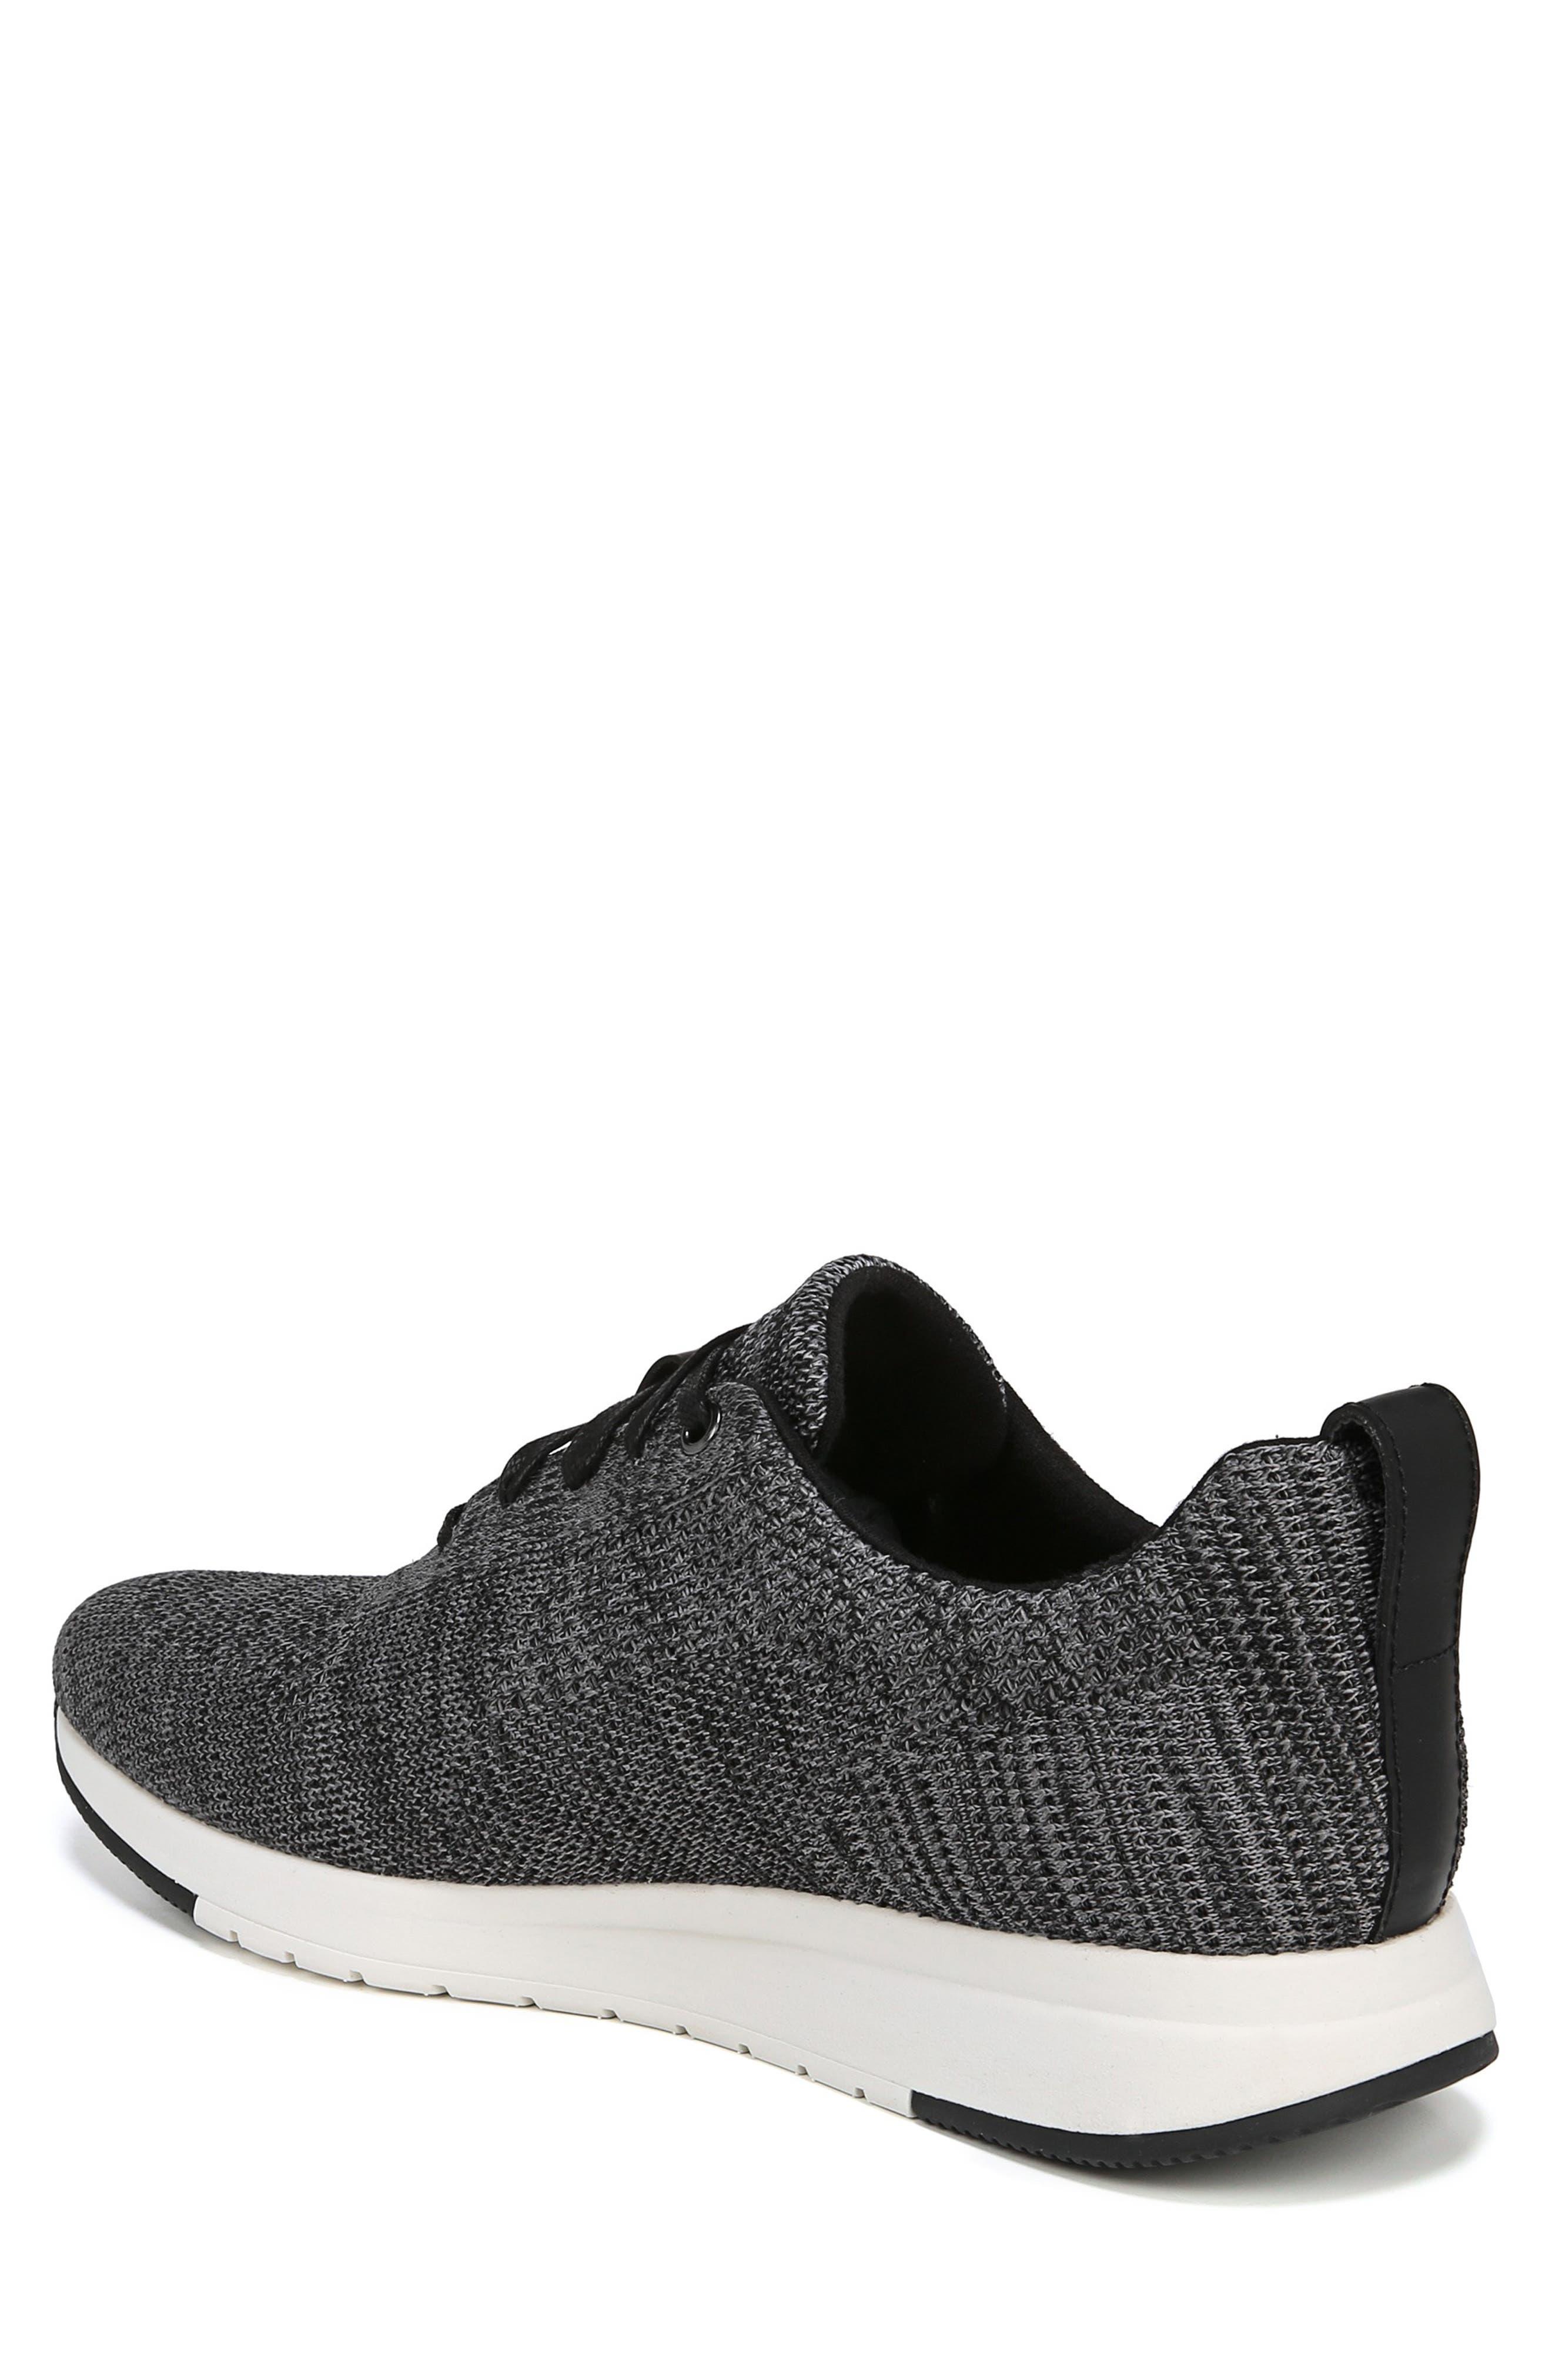 Palo Knit Sneaker,                             Alternate thumbnail 2, color,                             MARL GREY/ BLACK